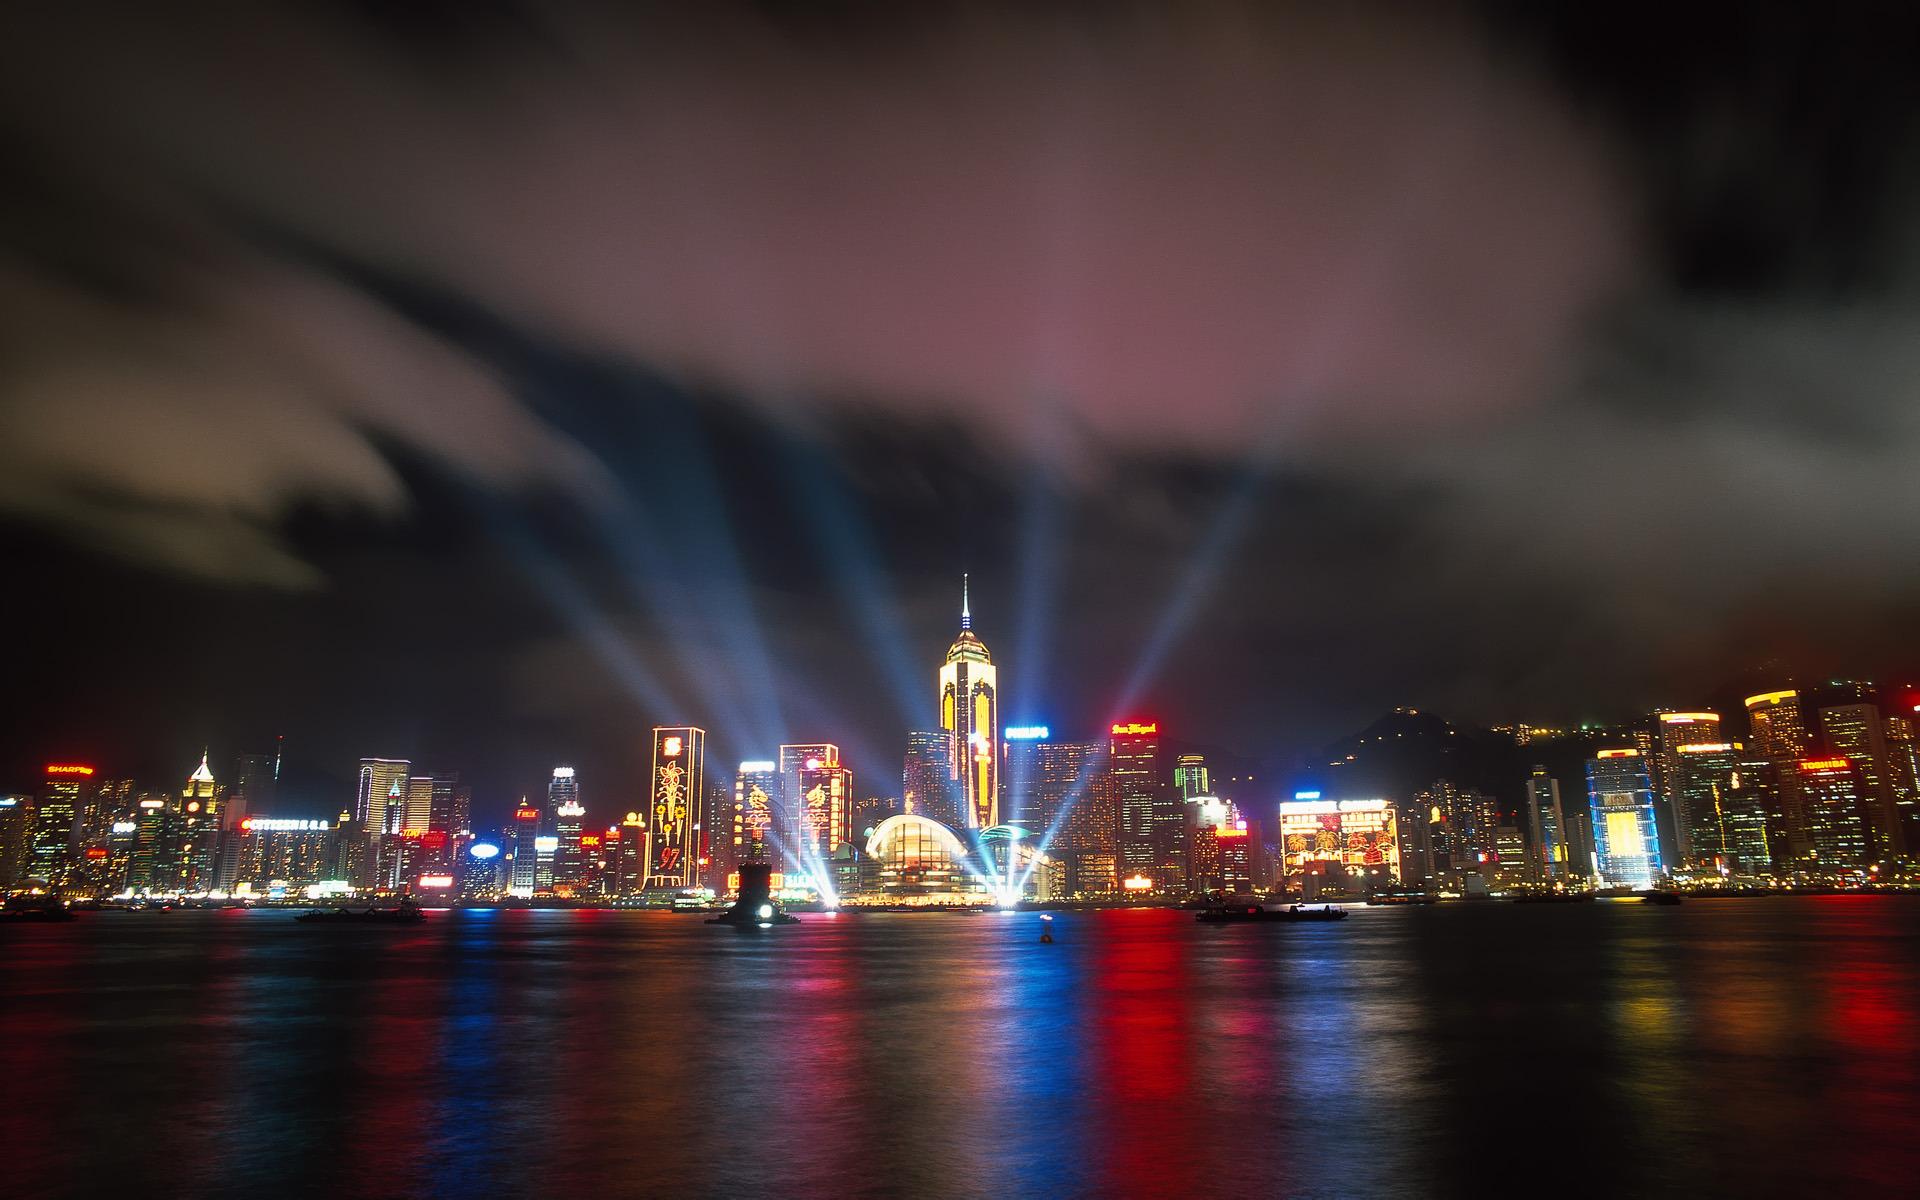 страны архитектура ночь Гонконг  № 1481667 бесплатно